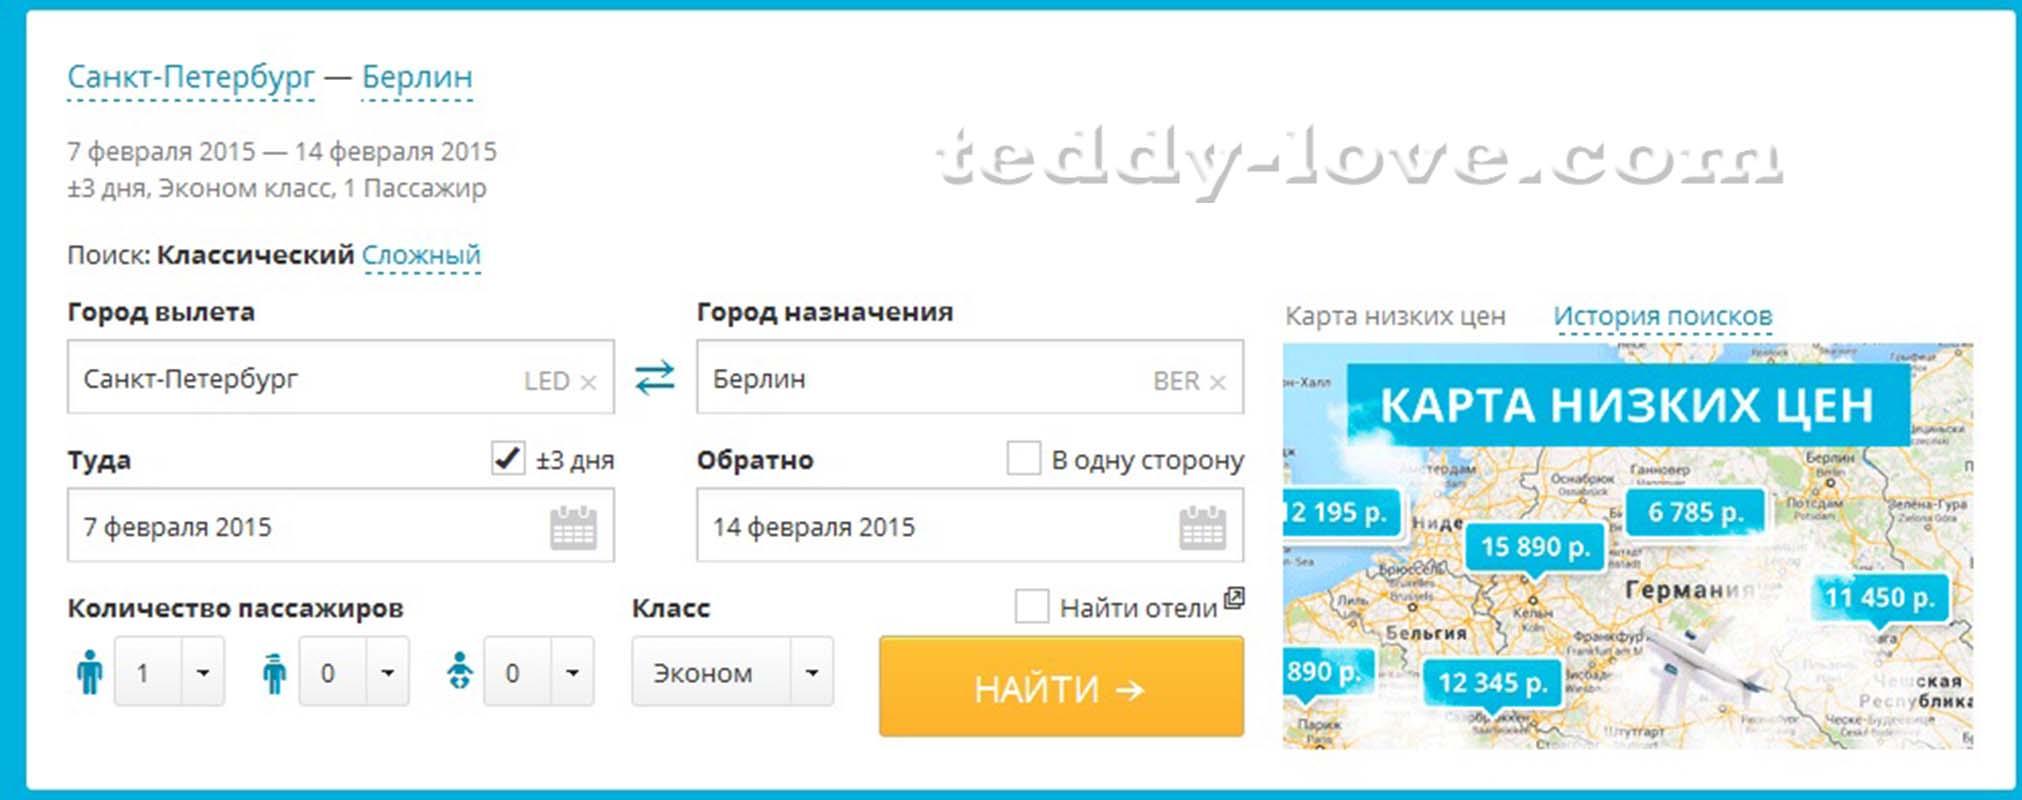 Цена билета на самолет до крыма из москвы